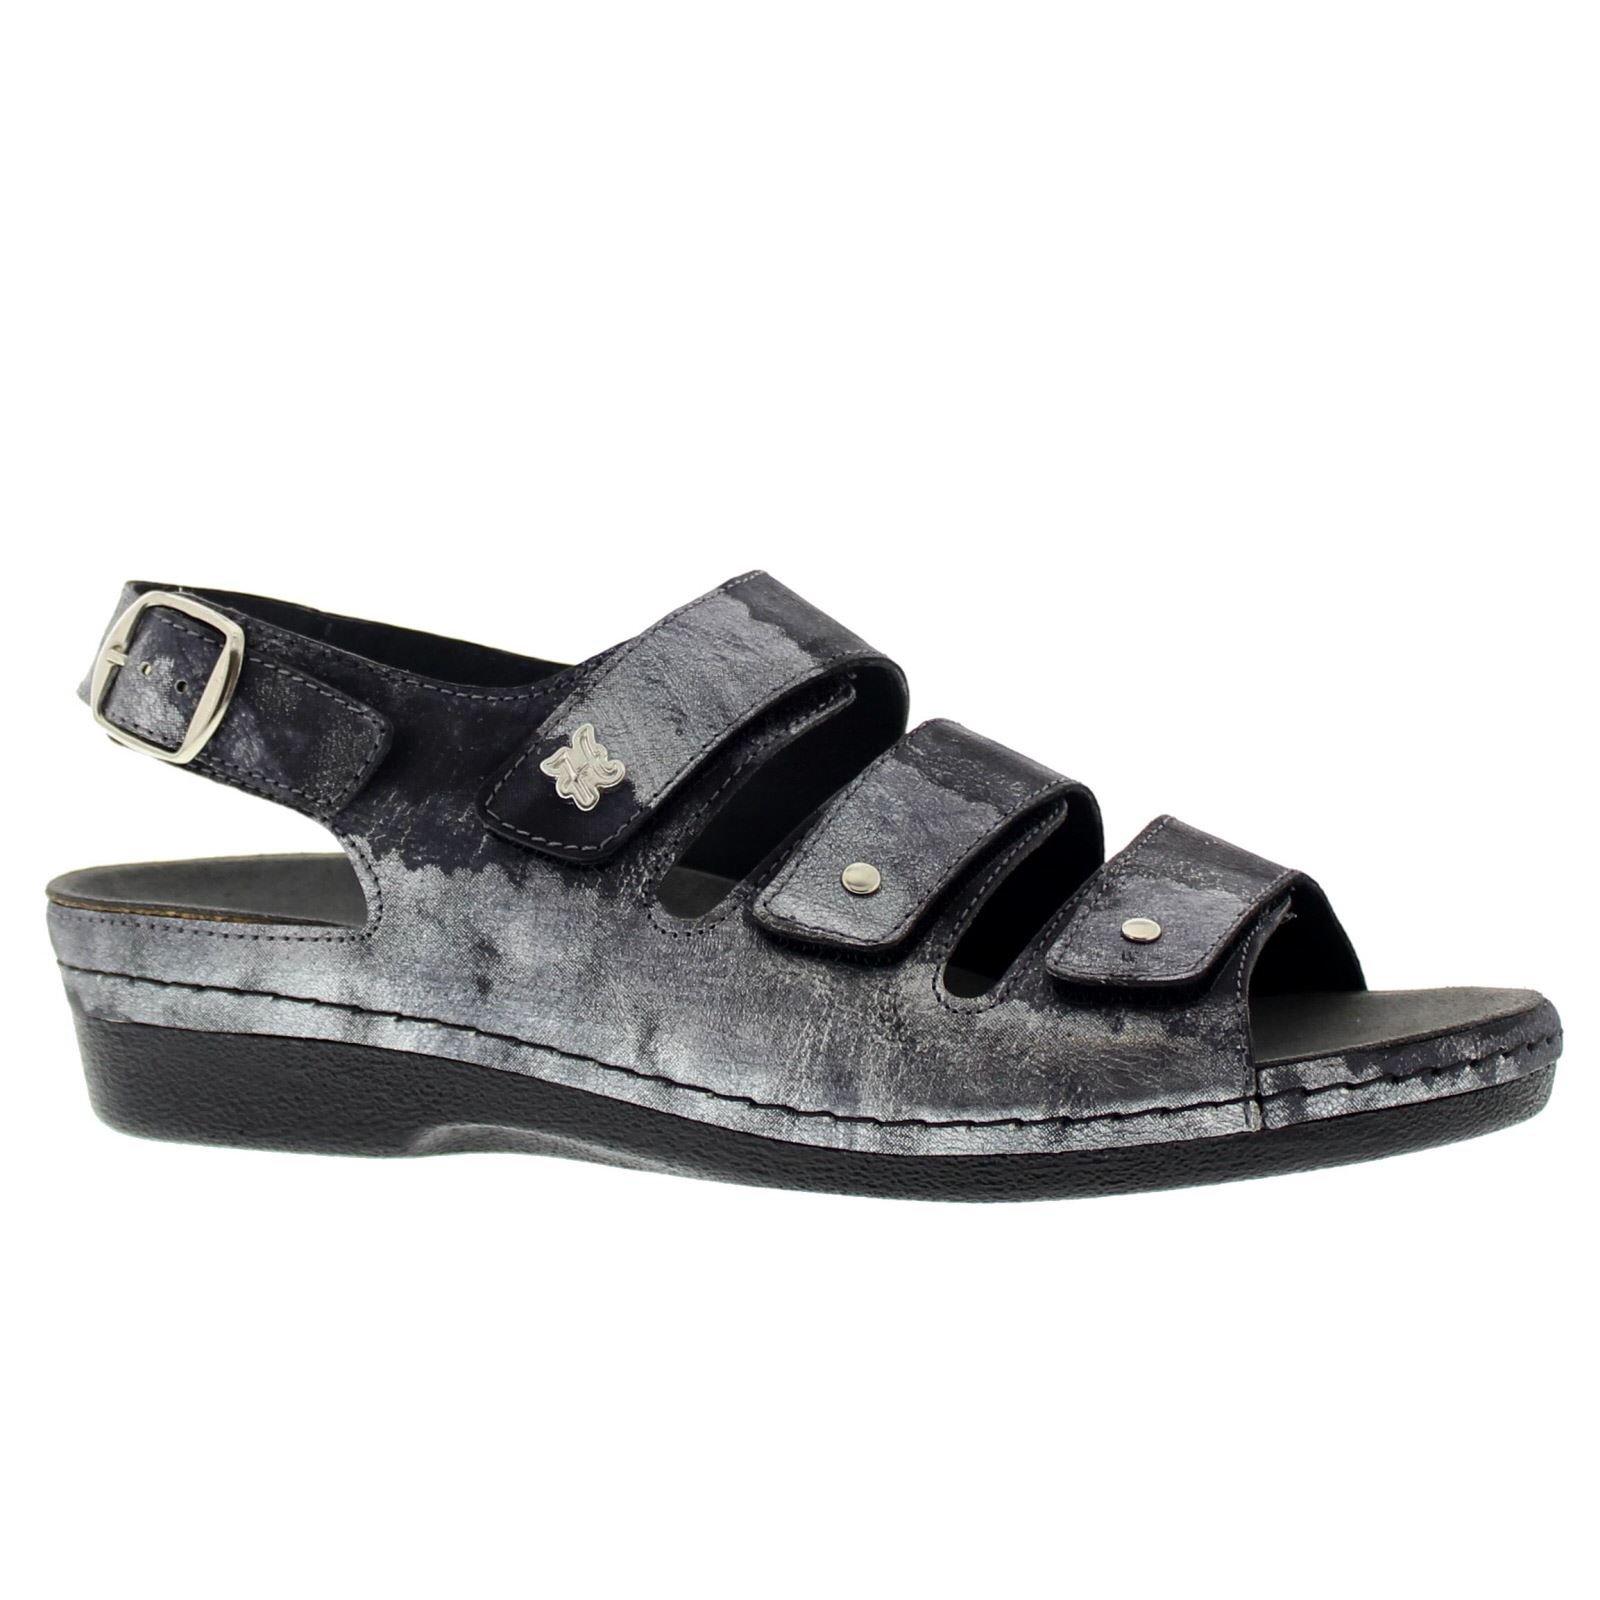 Helle Comfort Womens 356-F Black Silver Leather Sandals 38 EU